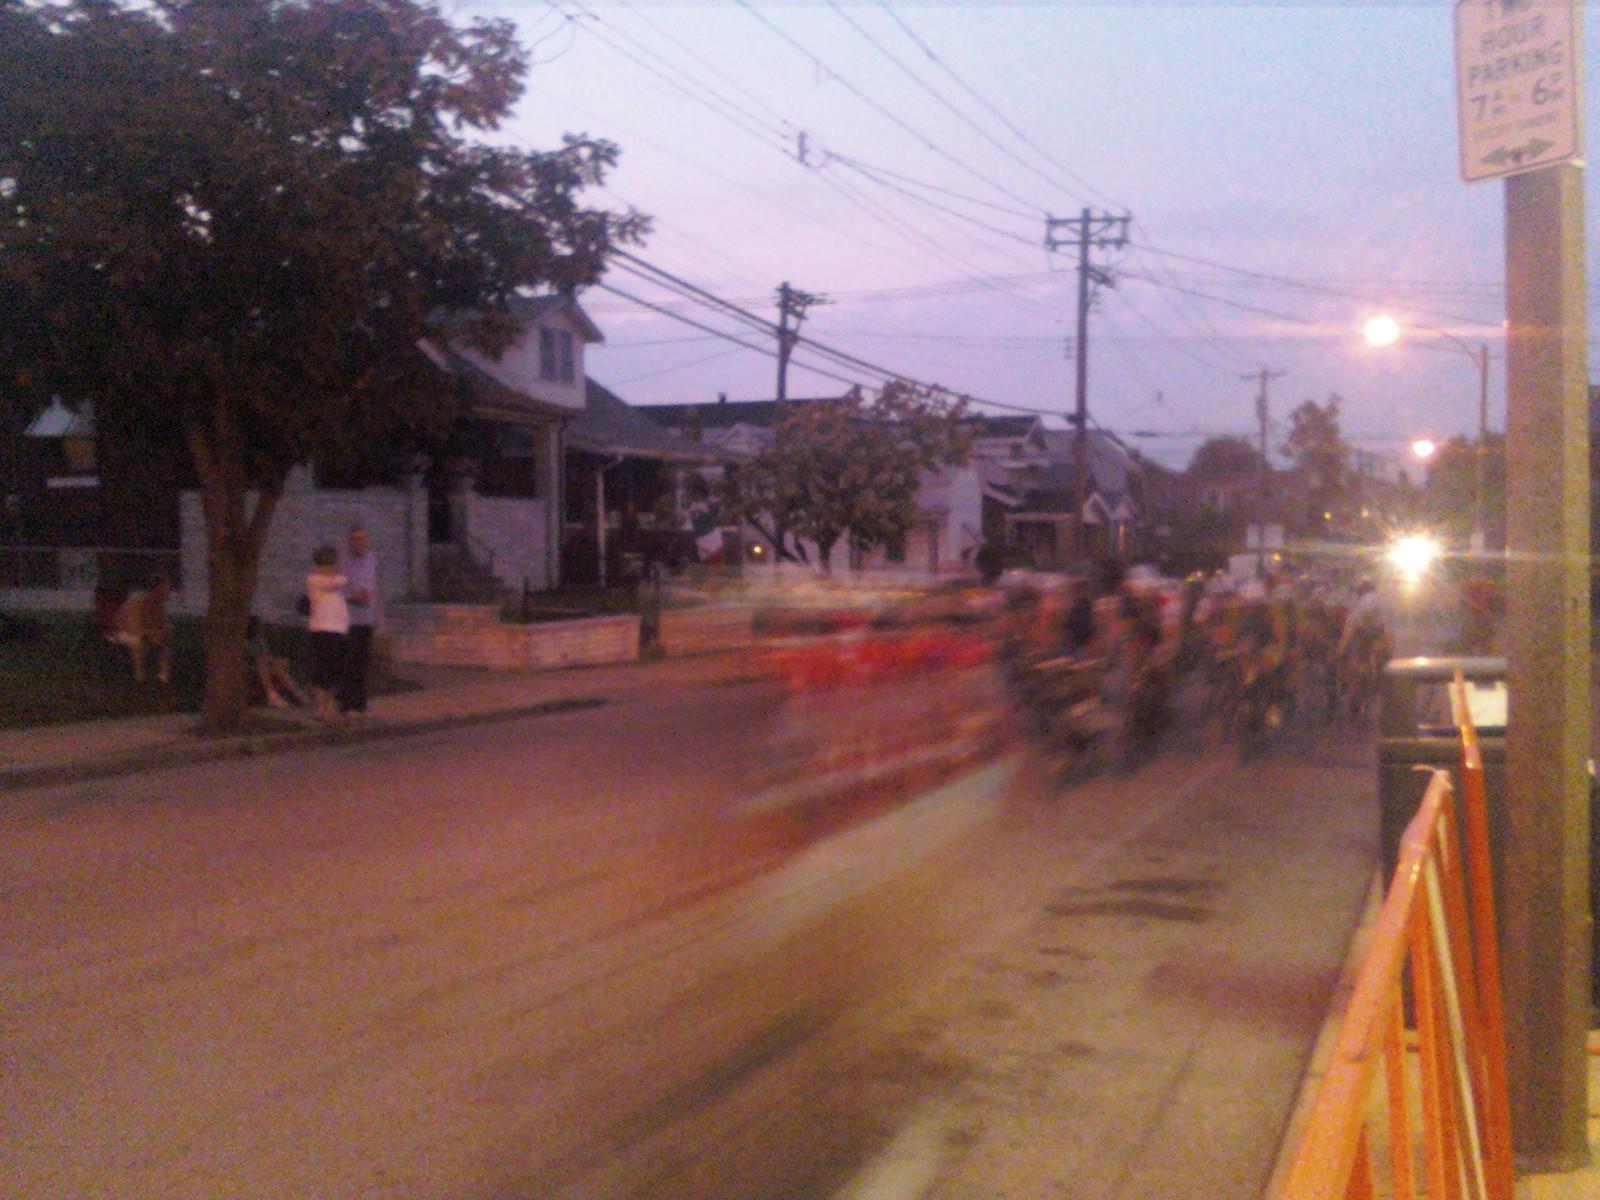 twilight racing from Mama Campisi's sidewalk